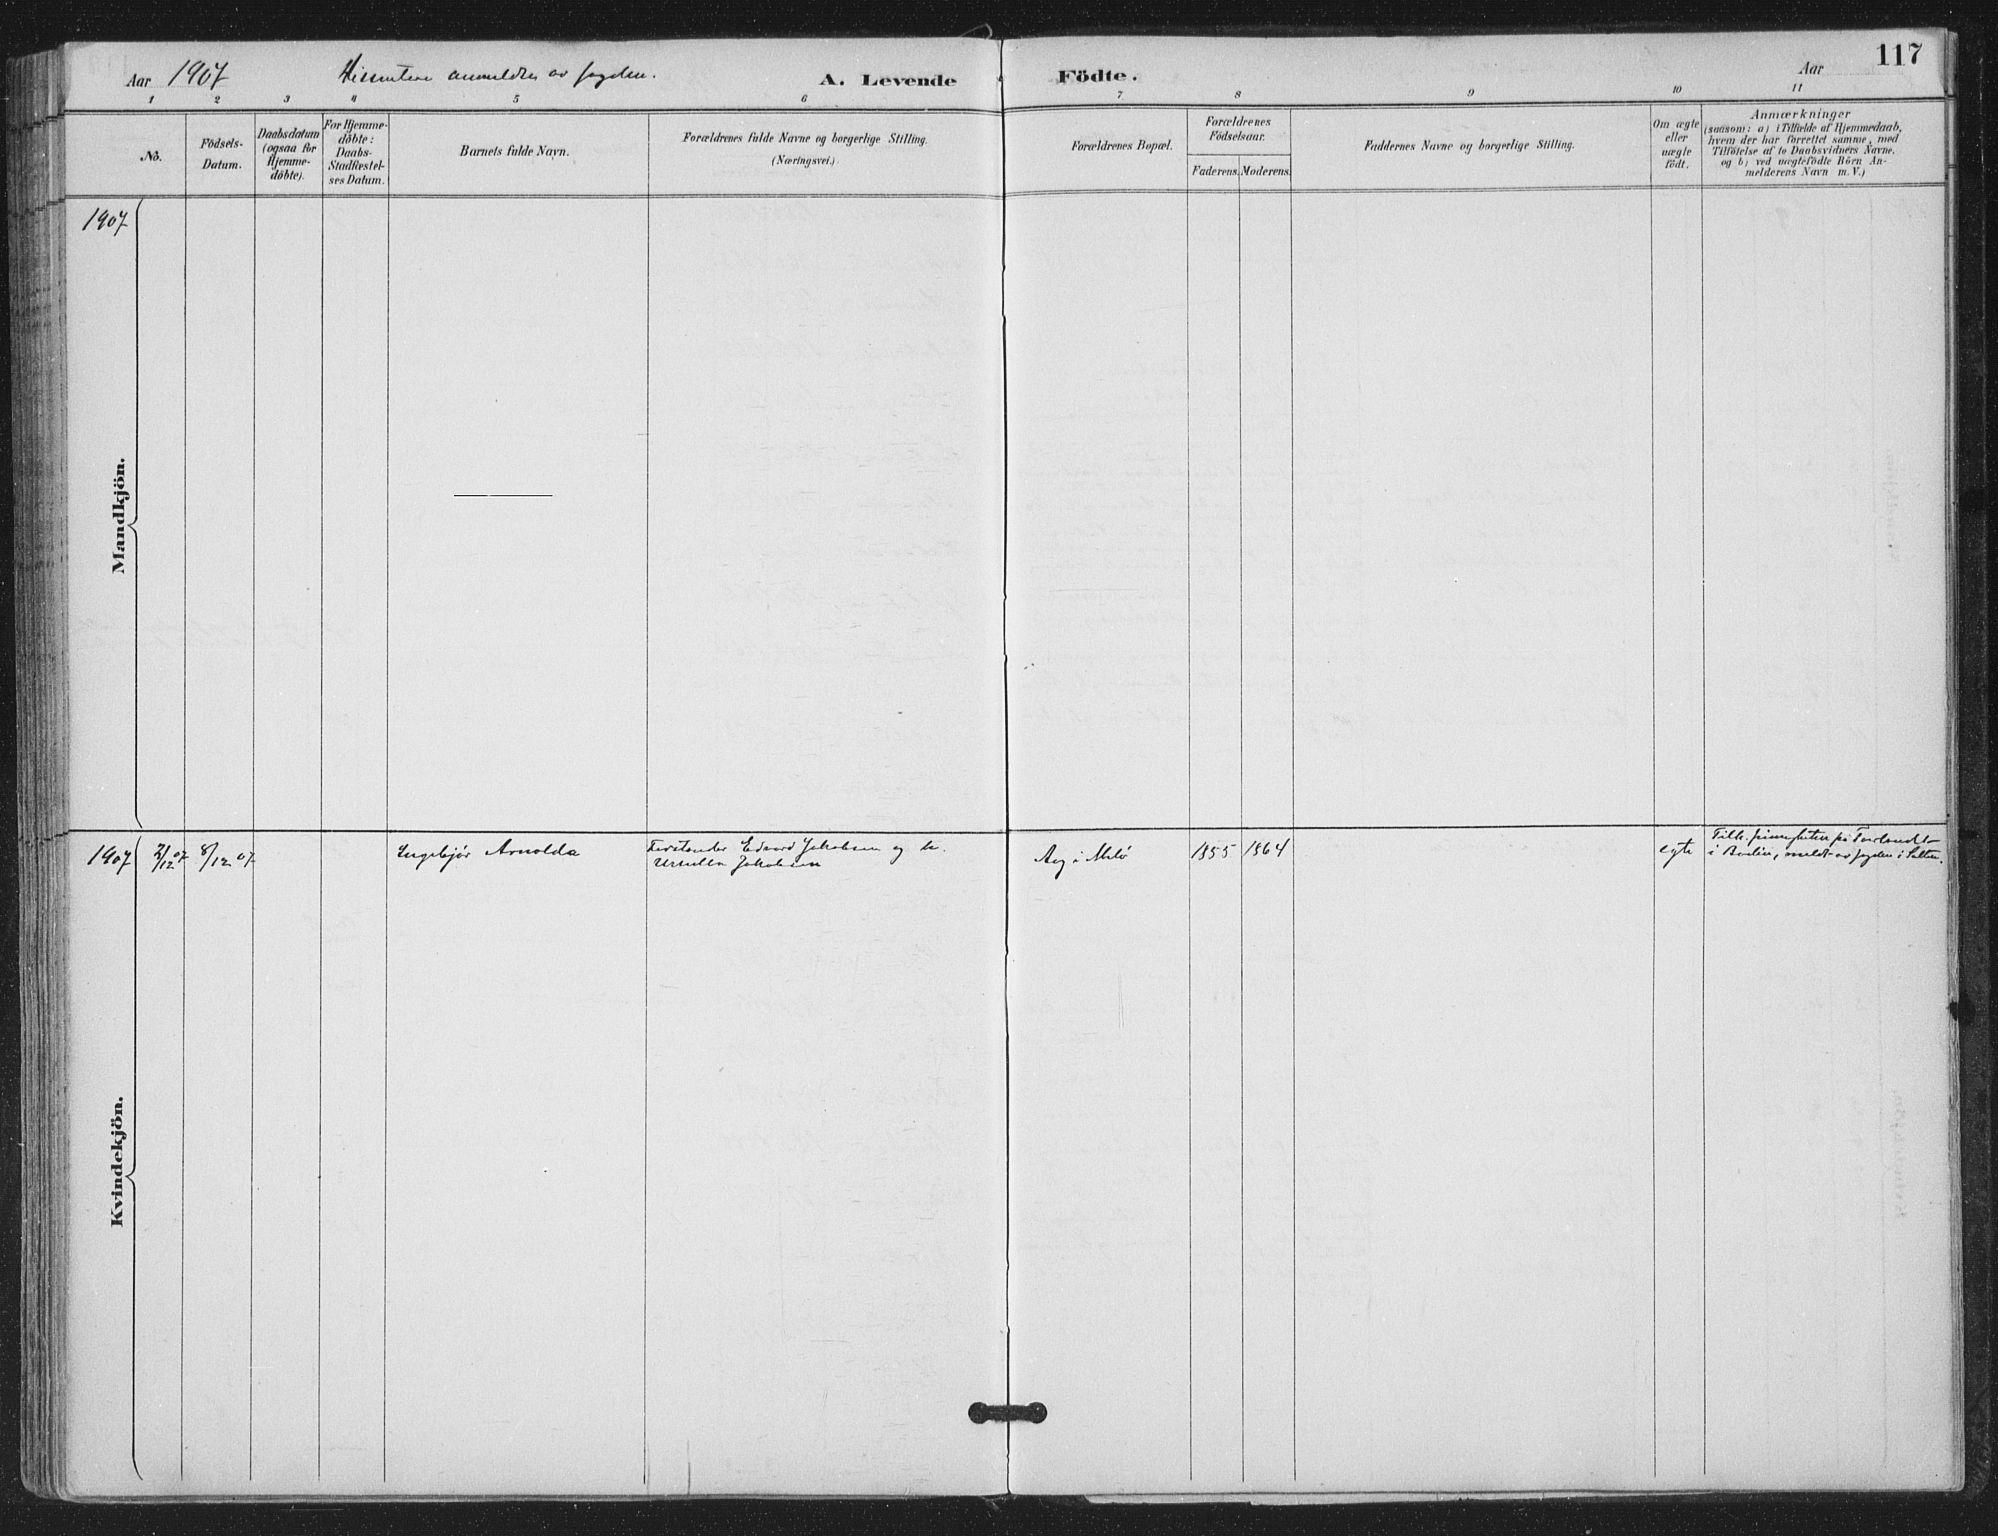 SAT, Ministerialprotokoller, klokkerbøker og fødselsregistre - Nordland, 843/L0628: Ministerialbok nr. 843A03, 1889-1907, s. 117